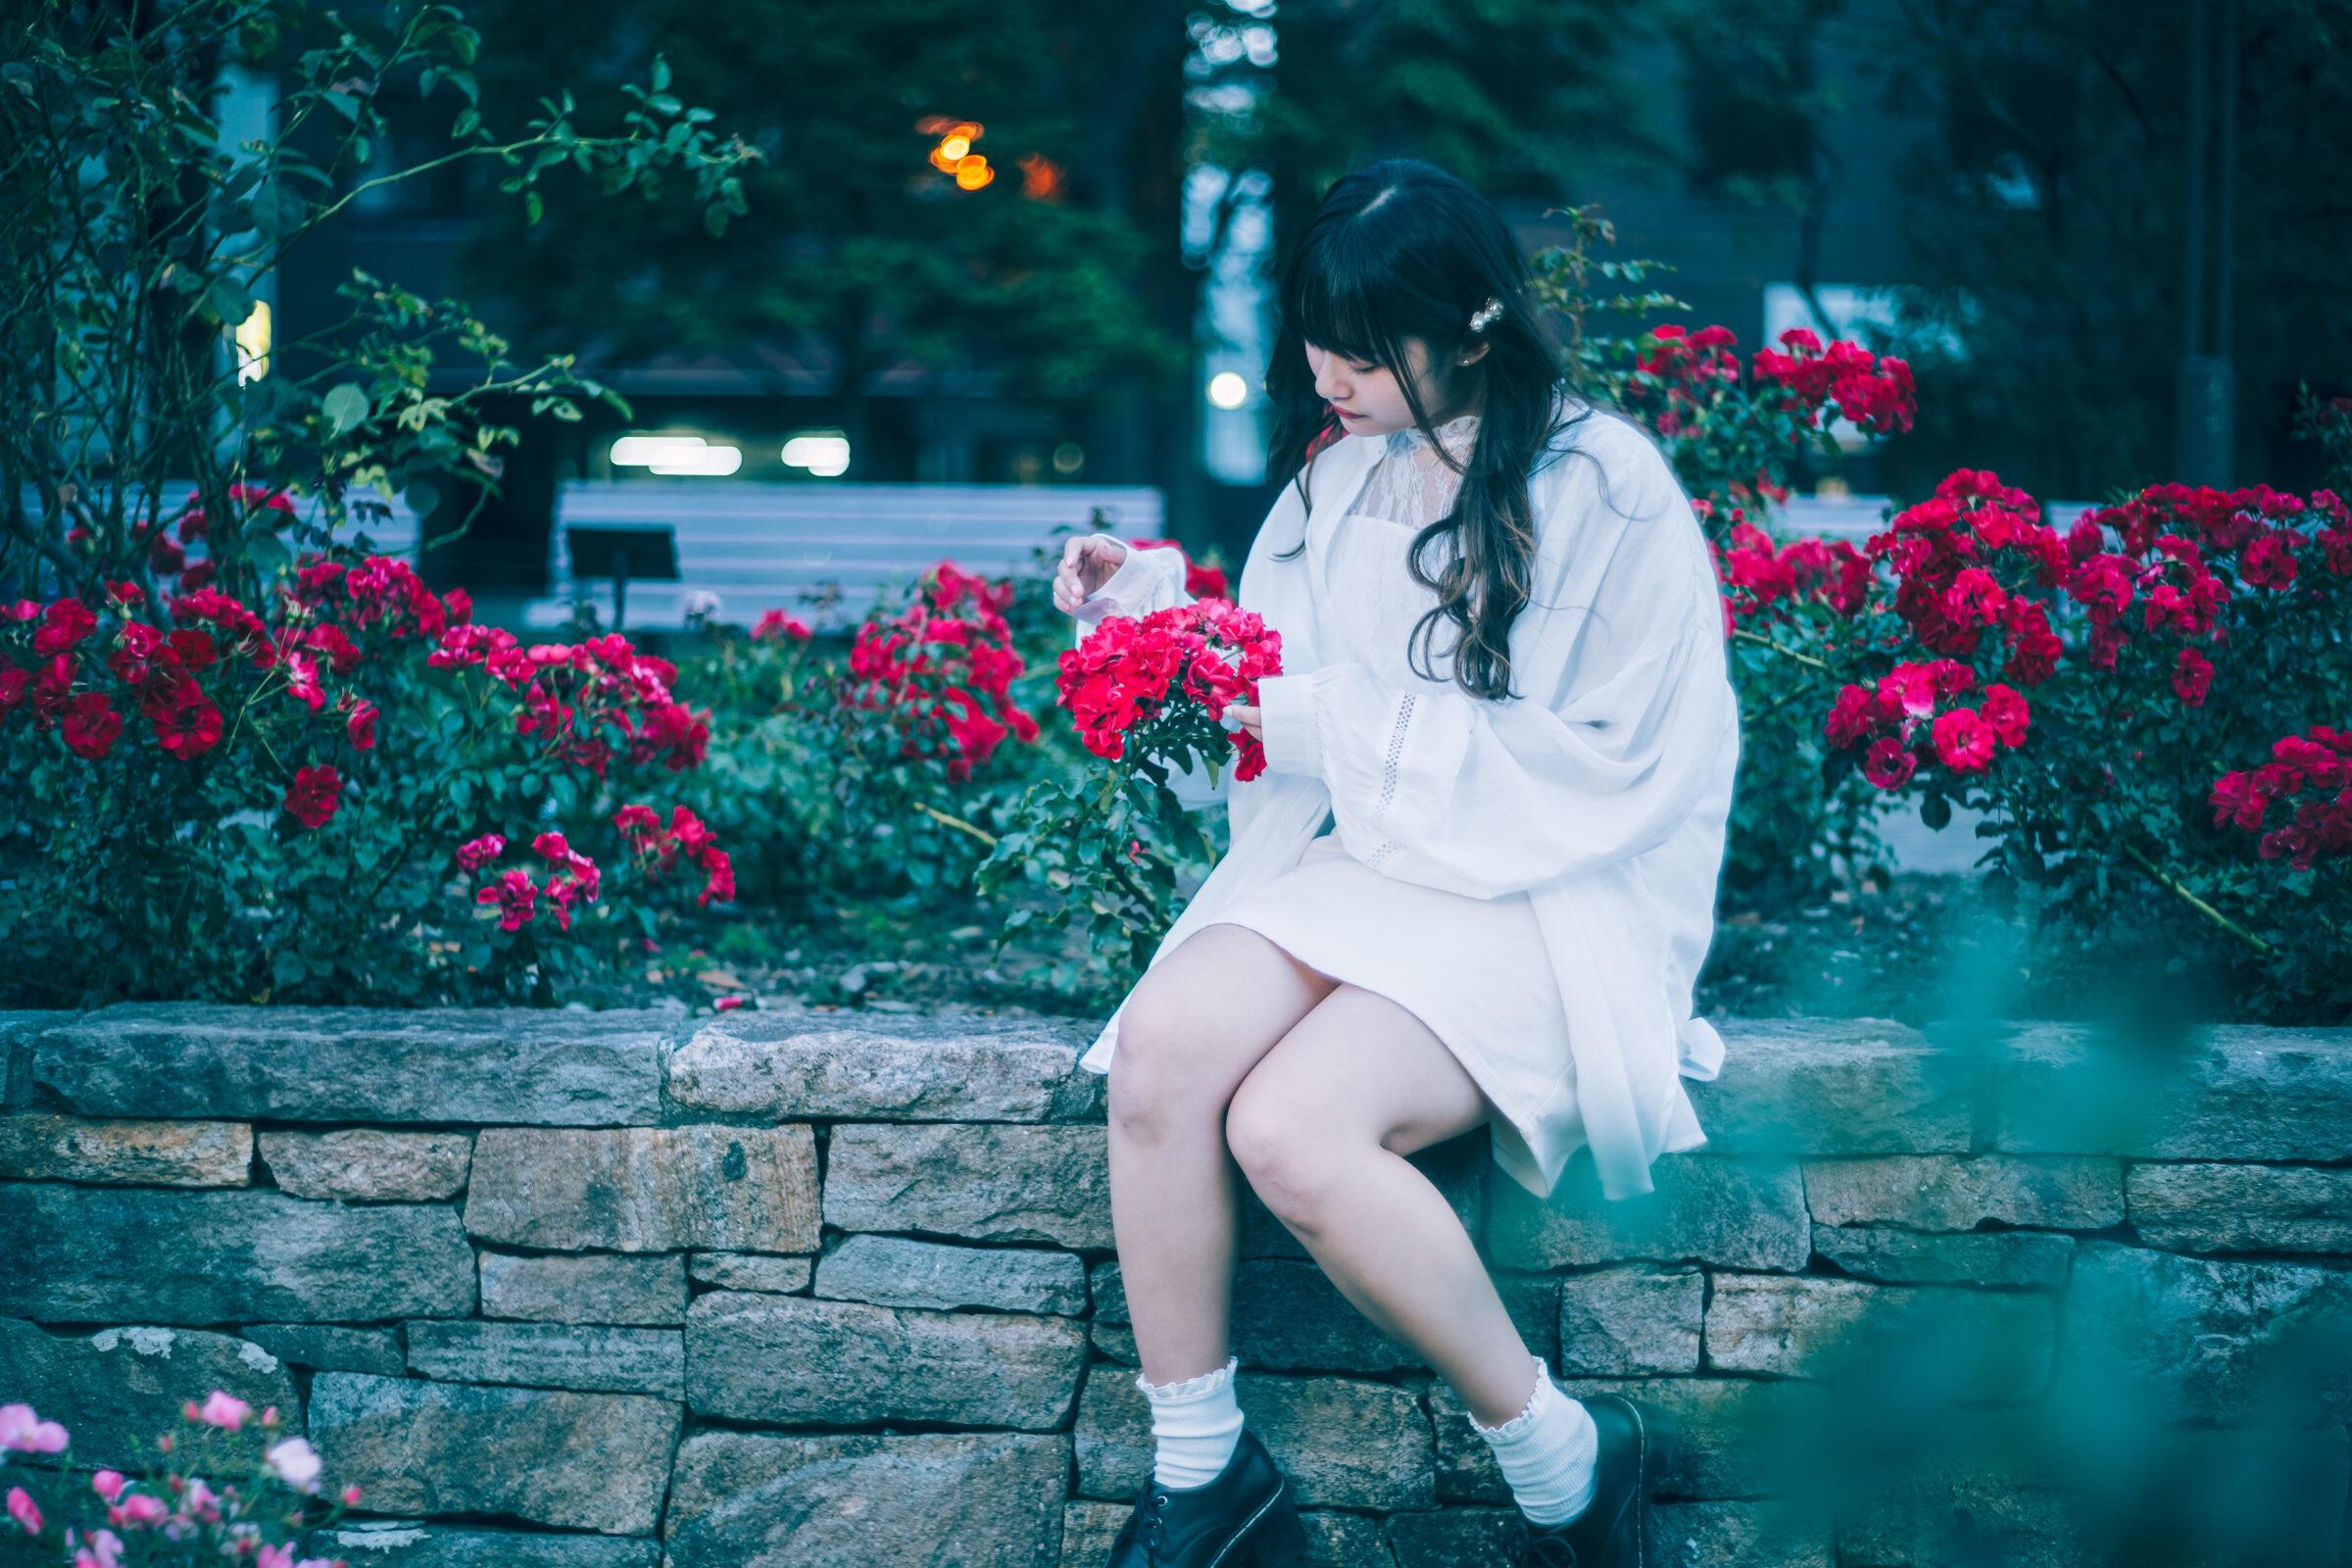 HAPPY少女♪ ちひろ ( 孫田ちひろ ) | SMP 札幌モデルプロ撮影会